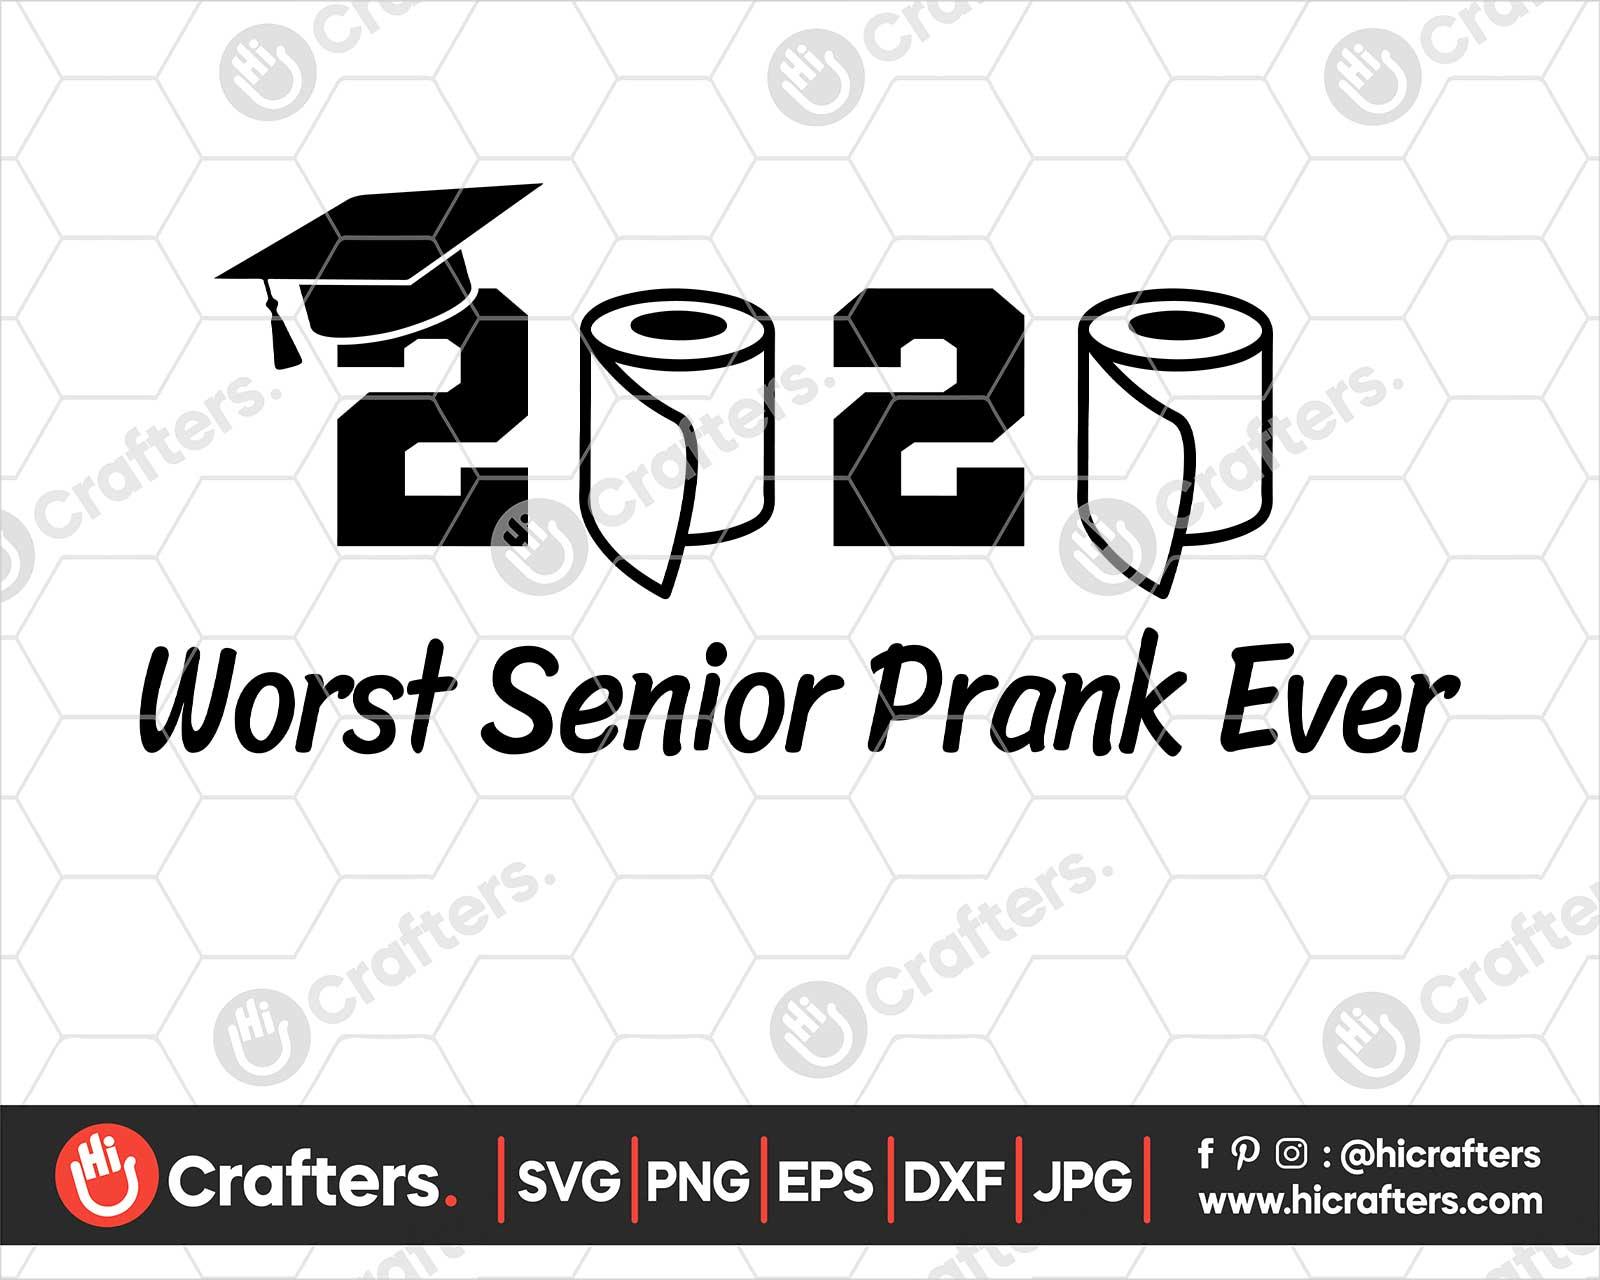 Senior 2020 Toilet Paper Svg Png For Cricut Hi Crafters